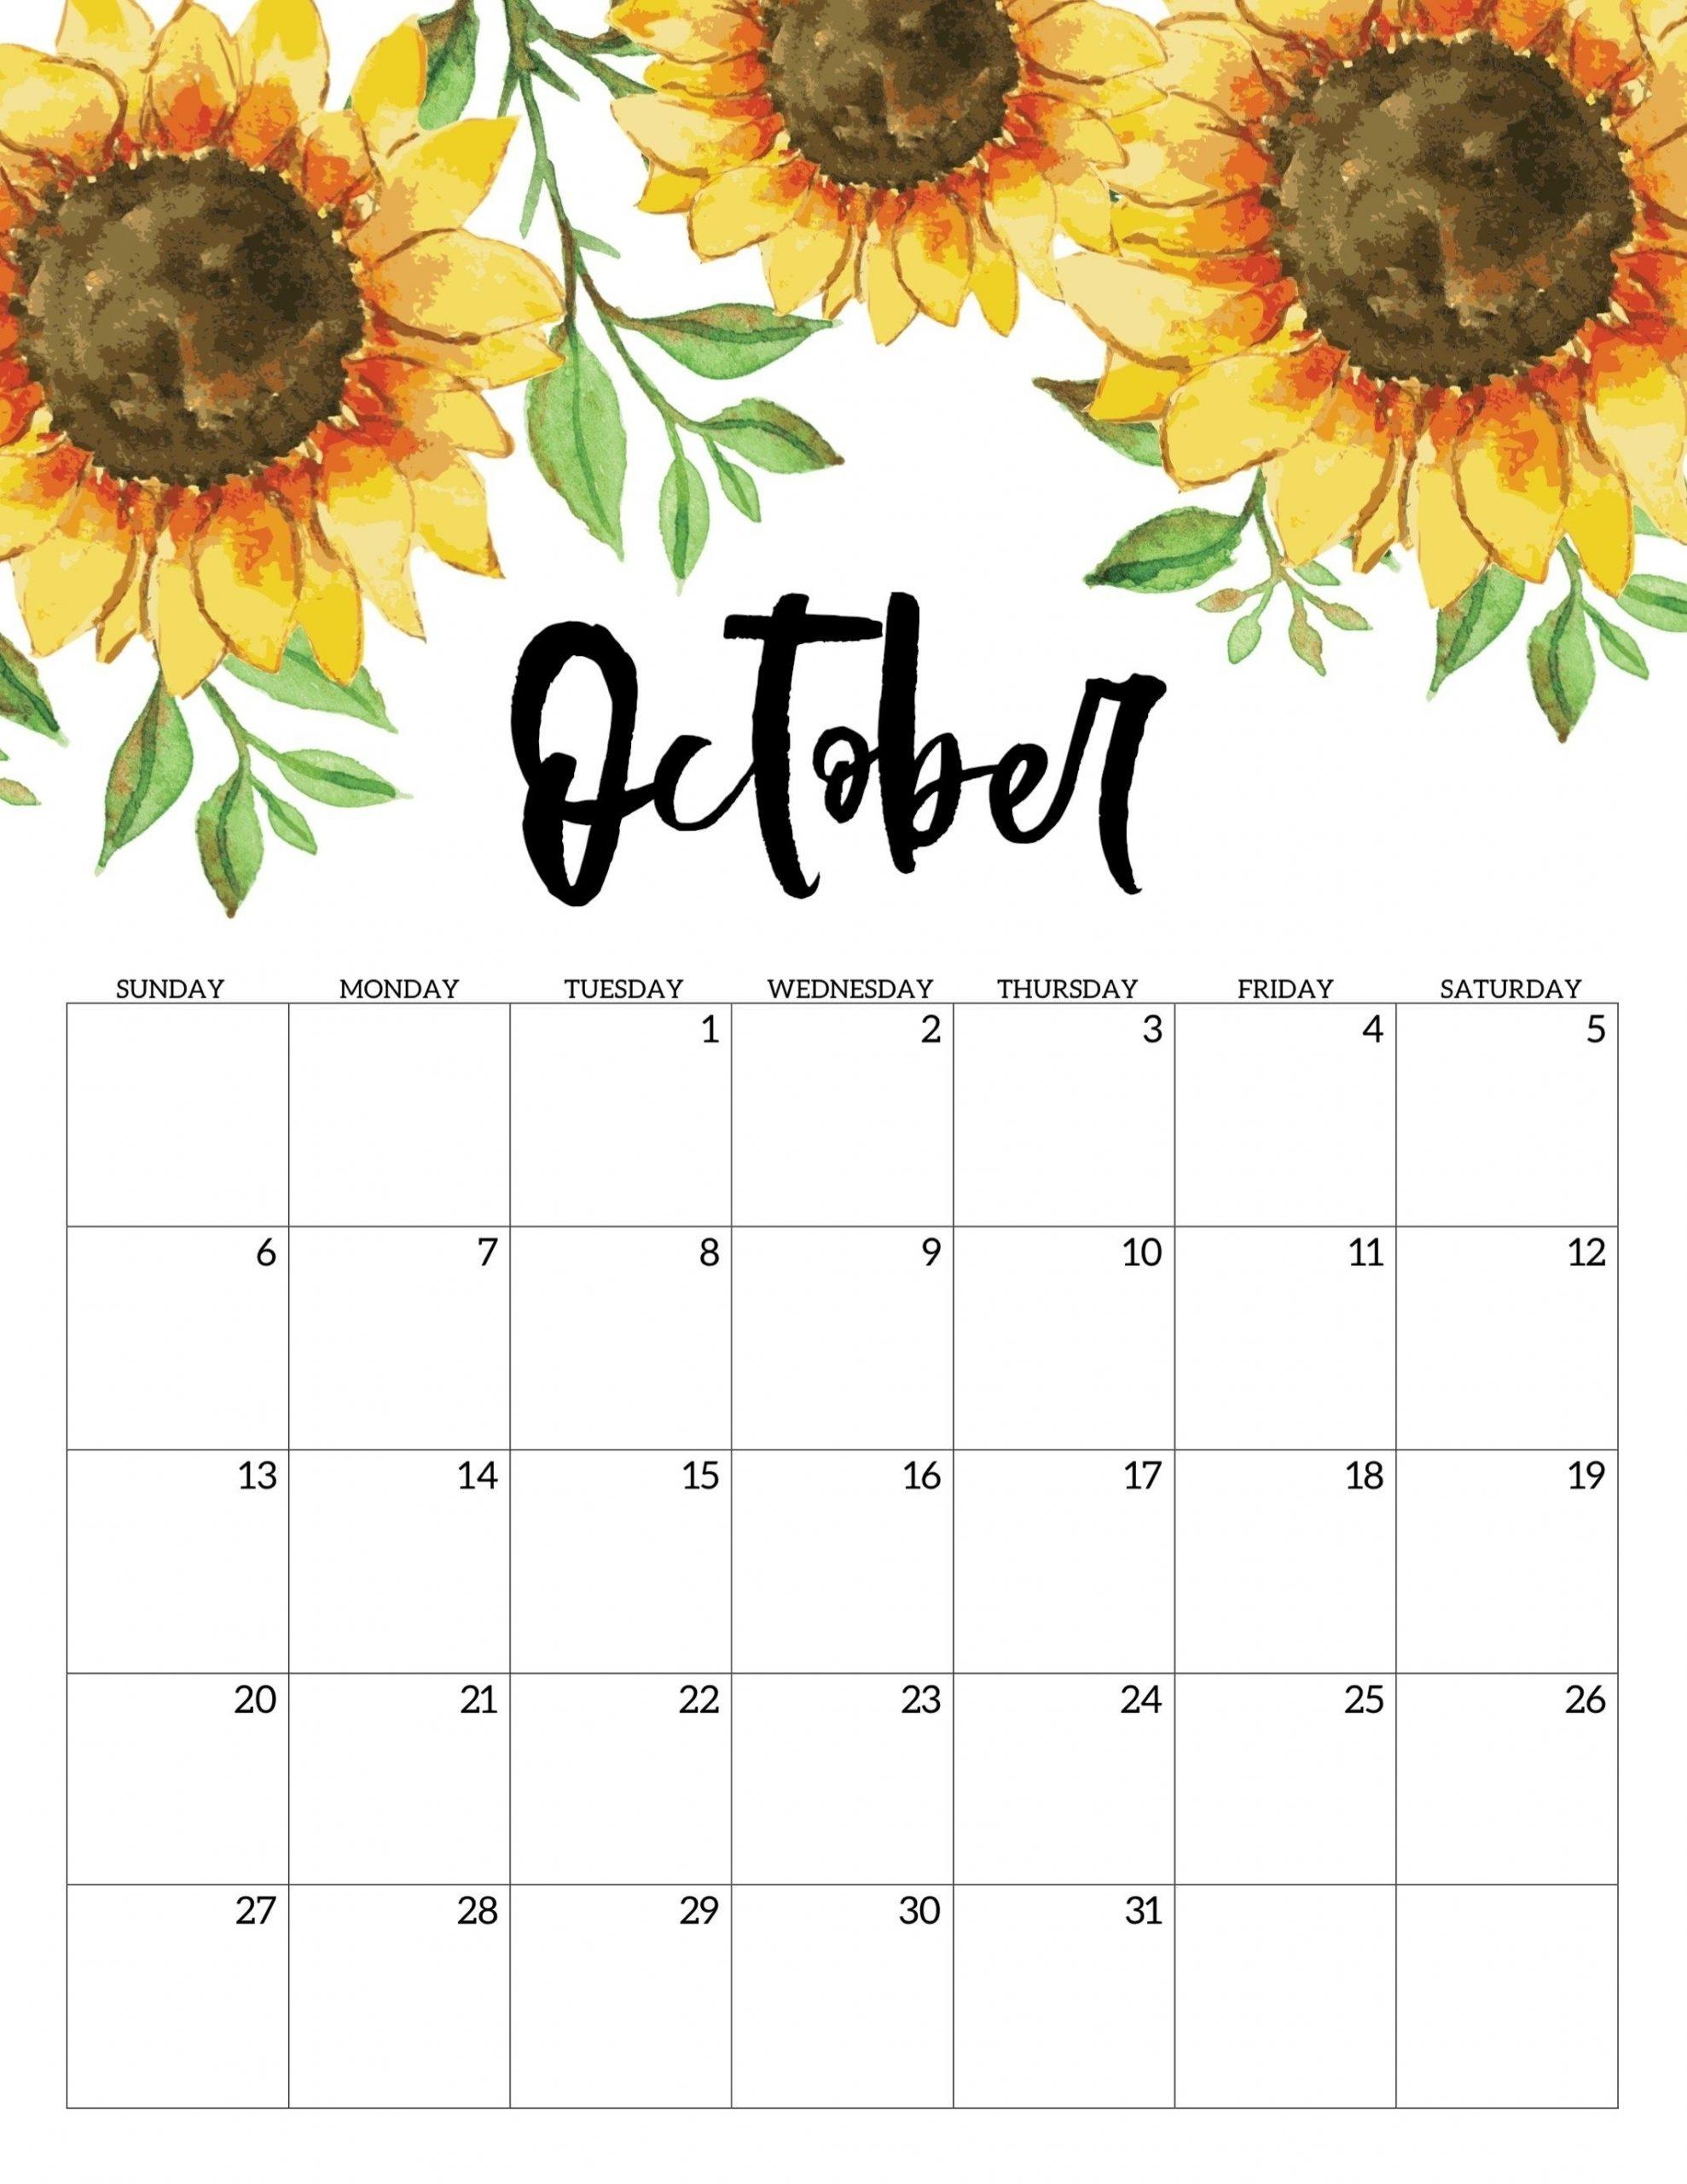 Print Calendar No Download In 2020 | Calendar Printables